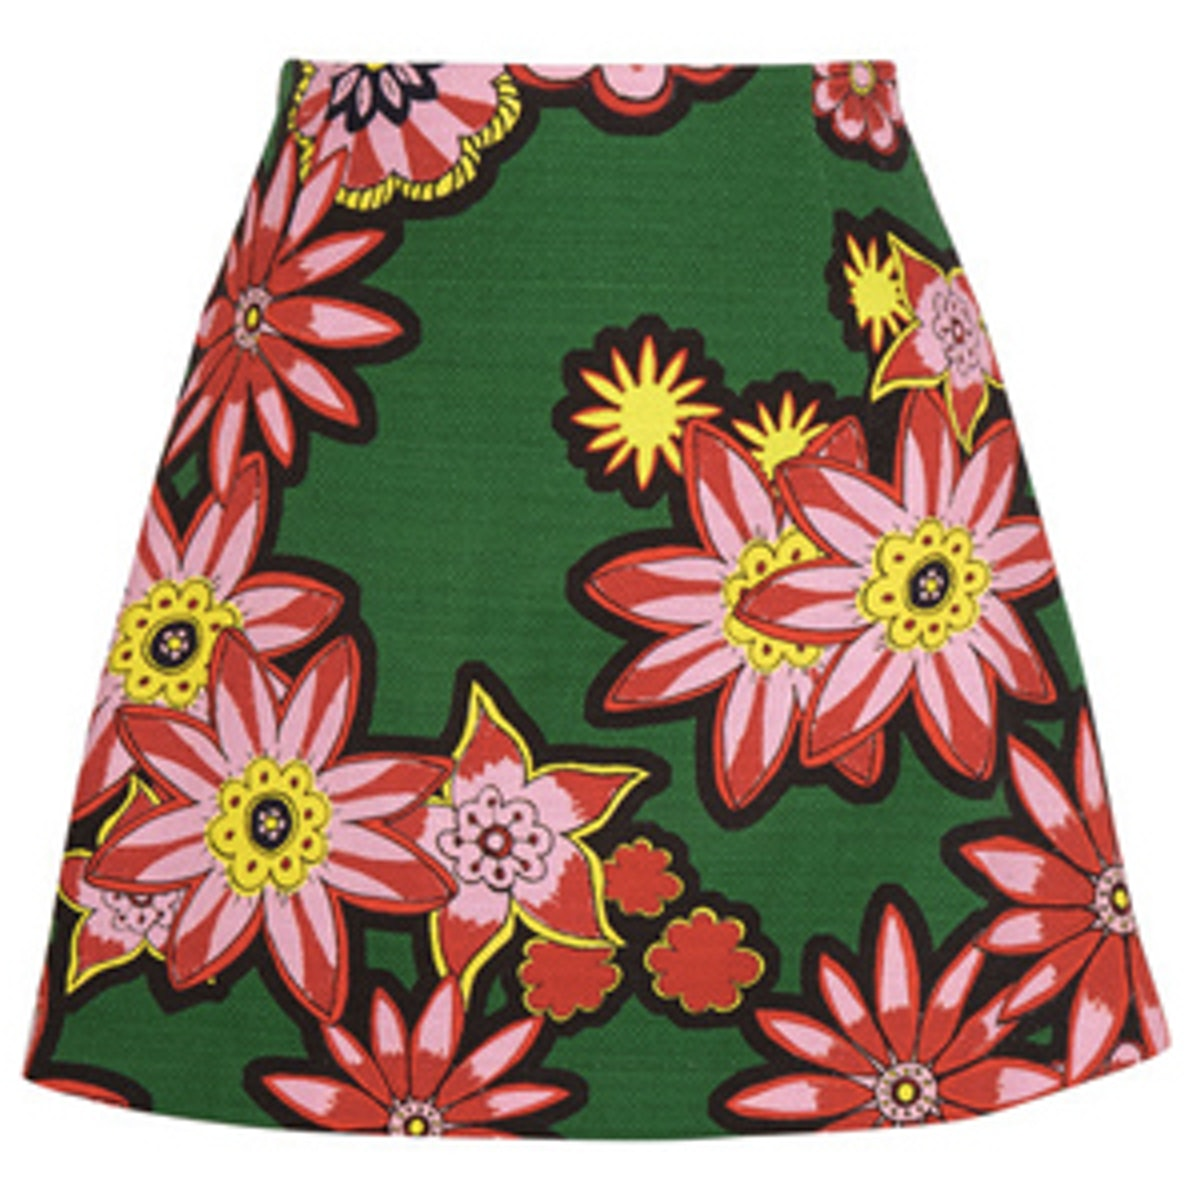 Dolly Floral-Print Woven Cotton Mini Skirt